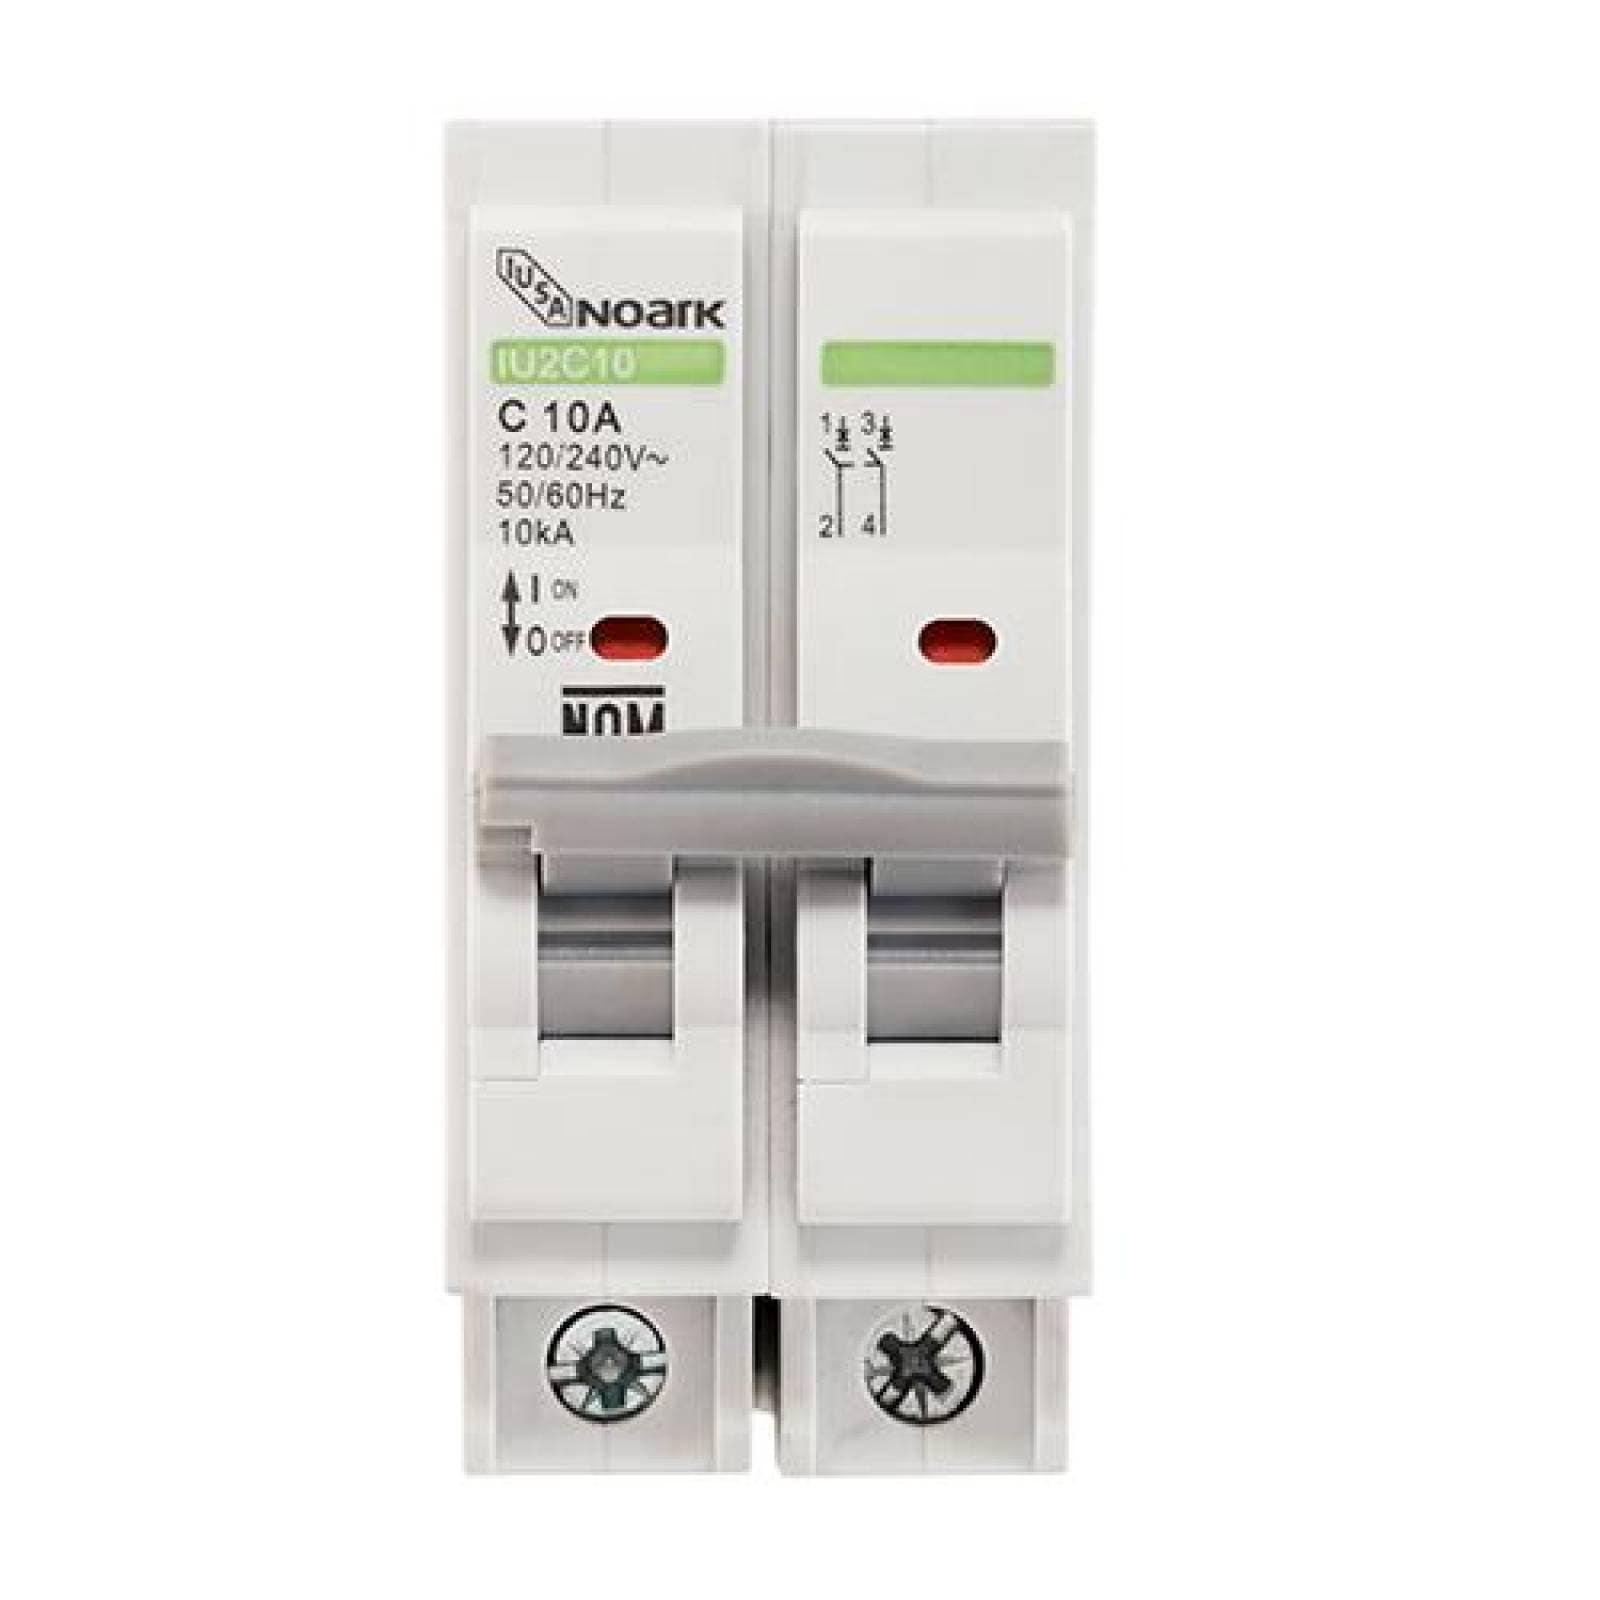 Interruptor termomagnético 2 polos 60 A